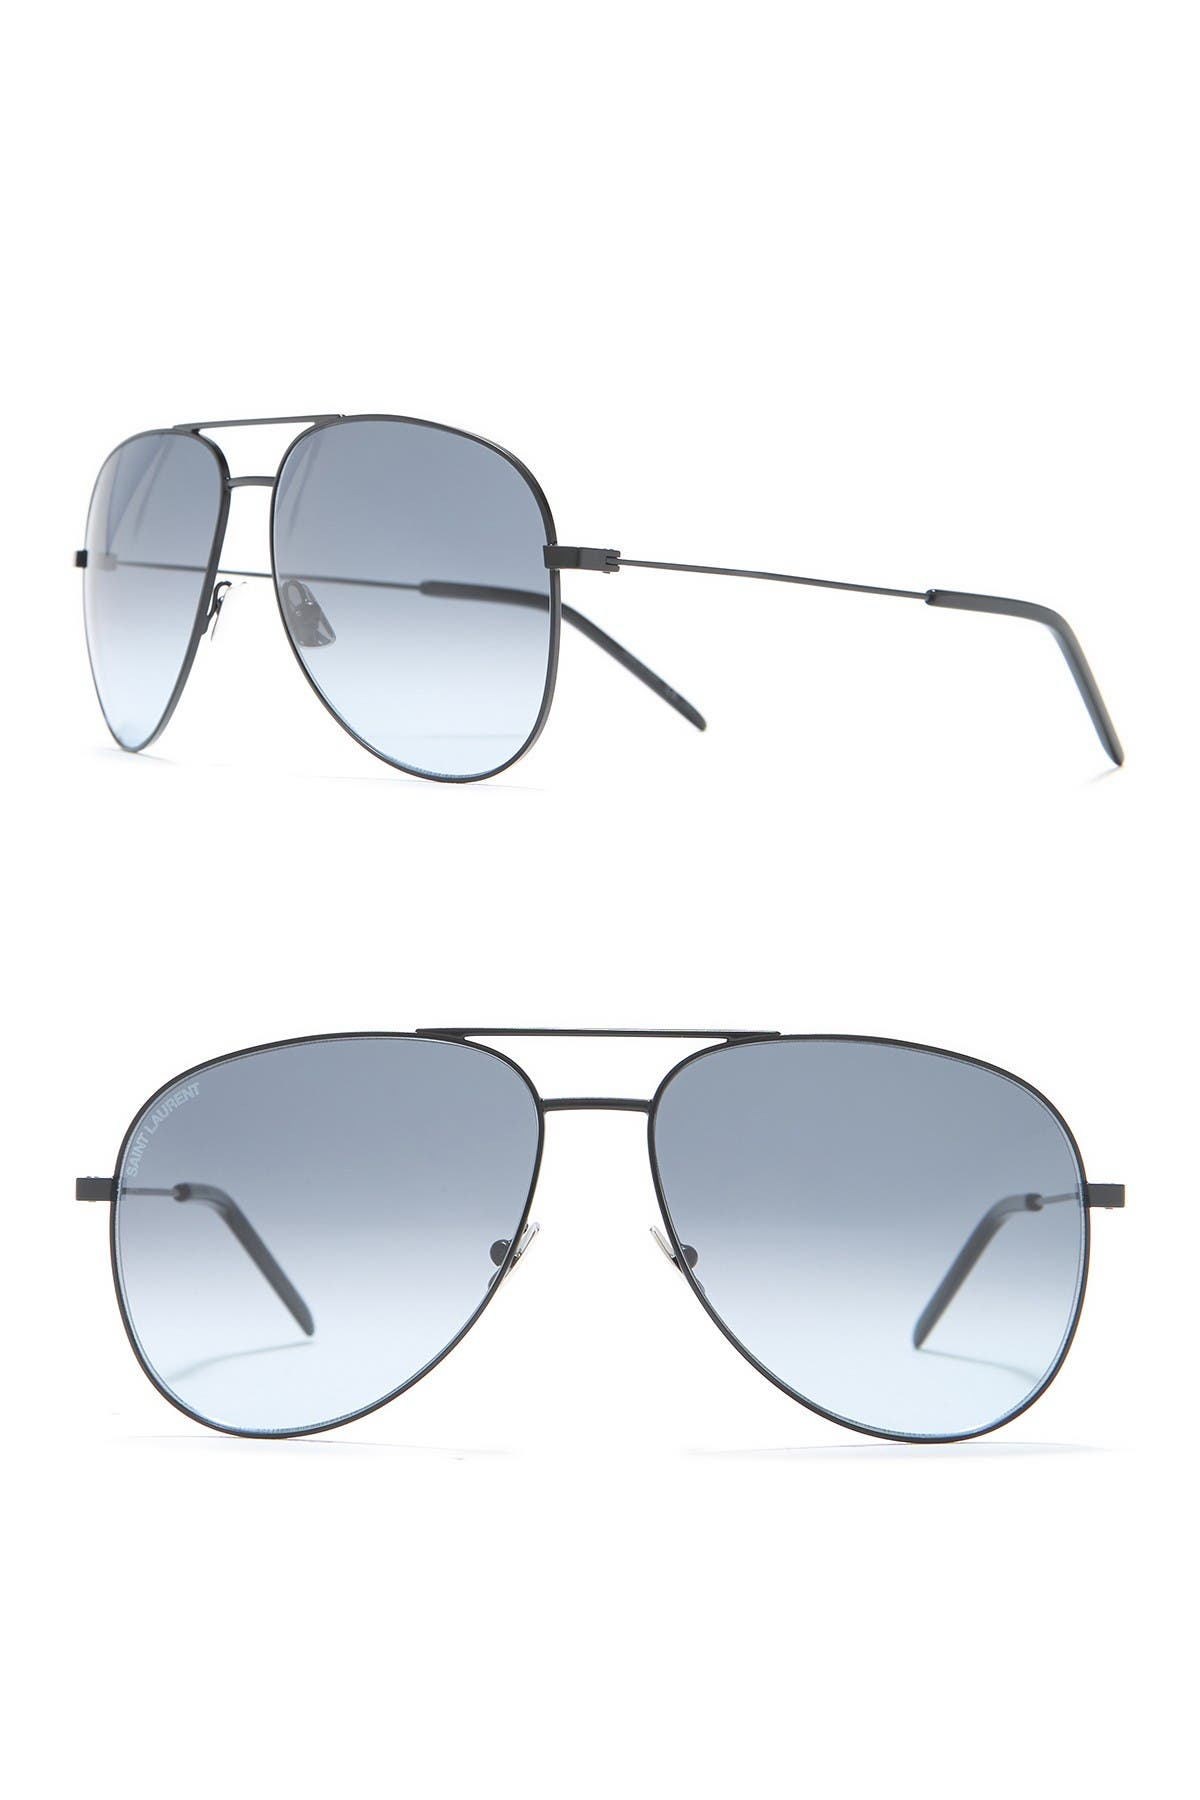 Image of Saint Laurent 59mm Aviator Sunglasses